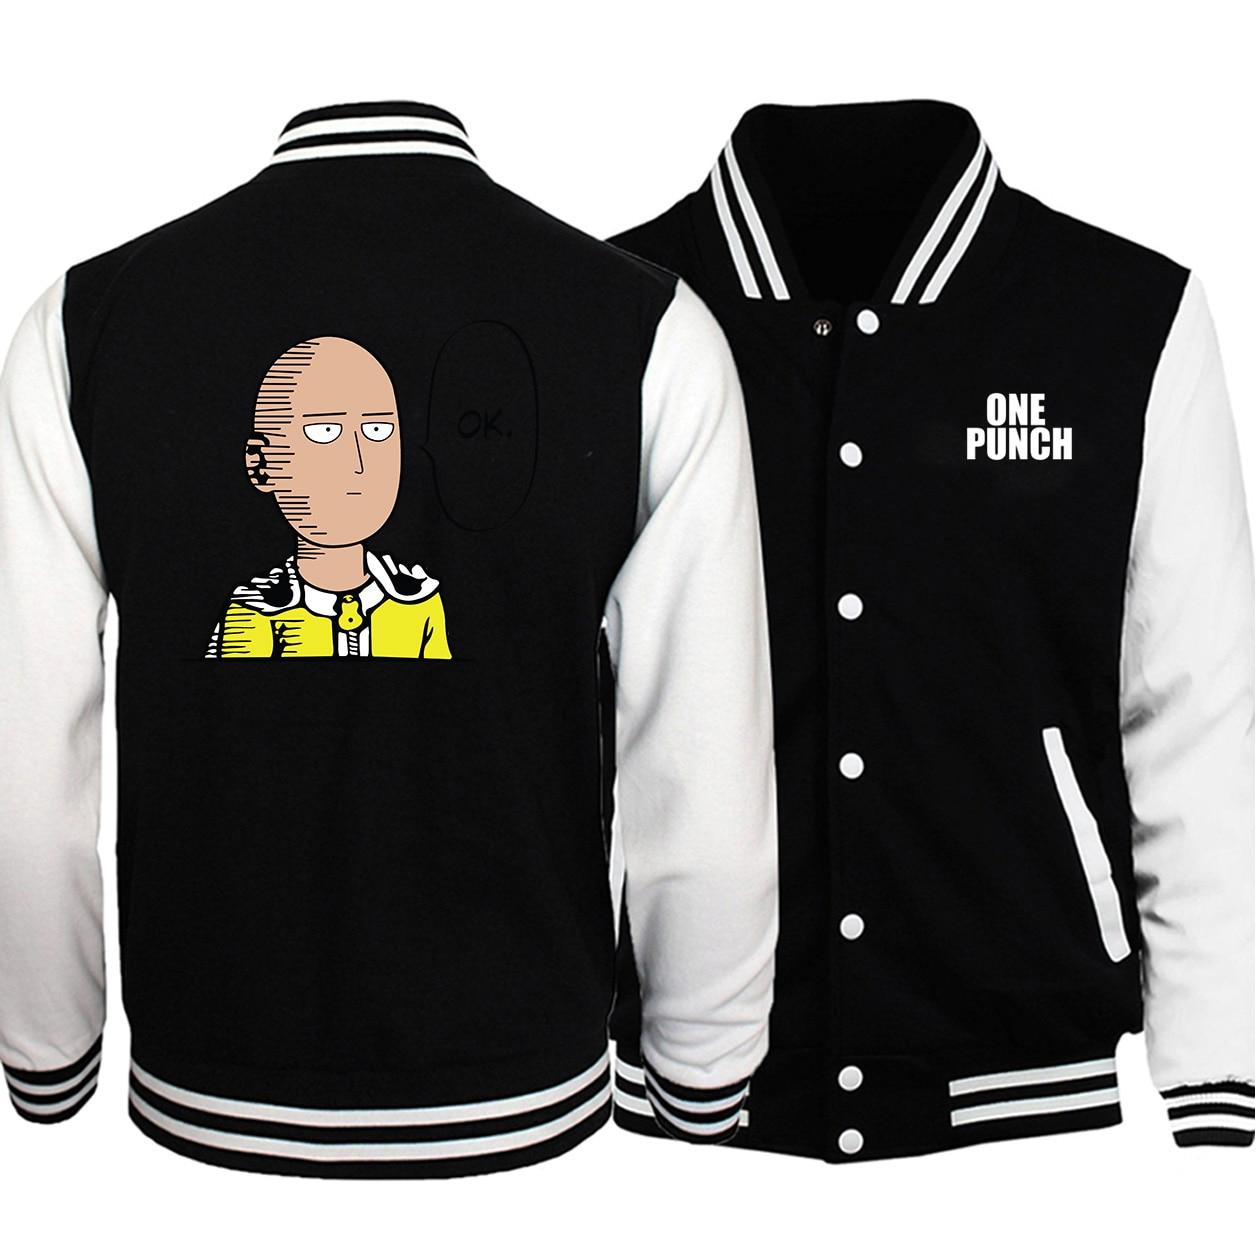 Uniforme de béisbol One Punch Man 2019, abrigo de otoño, chaqueta Bomber de Anime Saitama para hombre, chaqueta de béisbol Hip Hop masculina, ropa informal japonesa